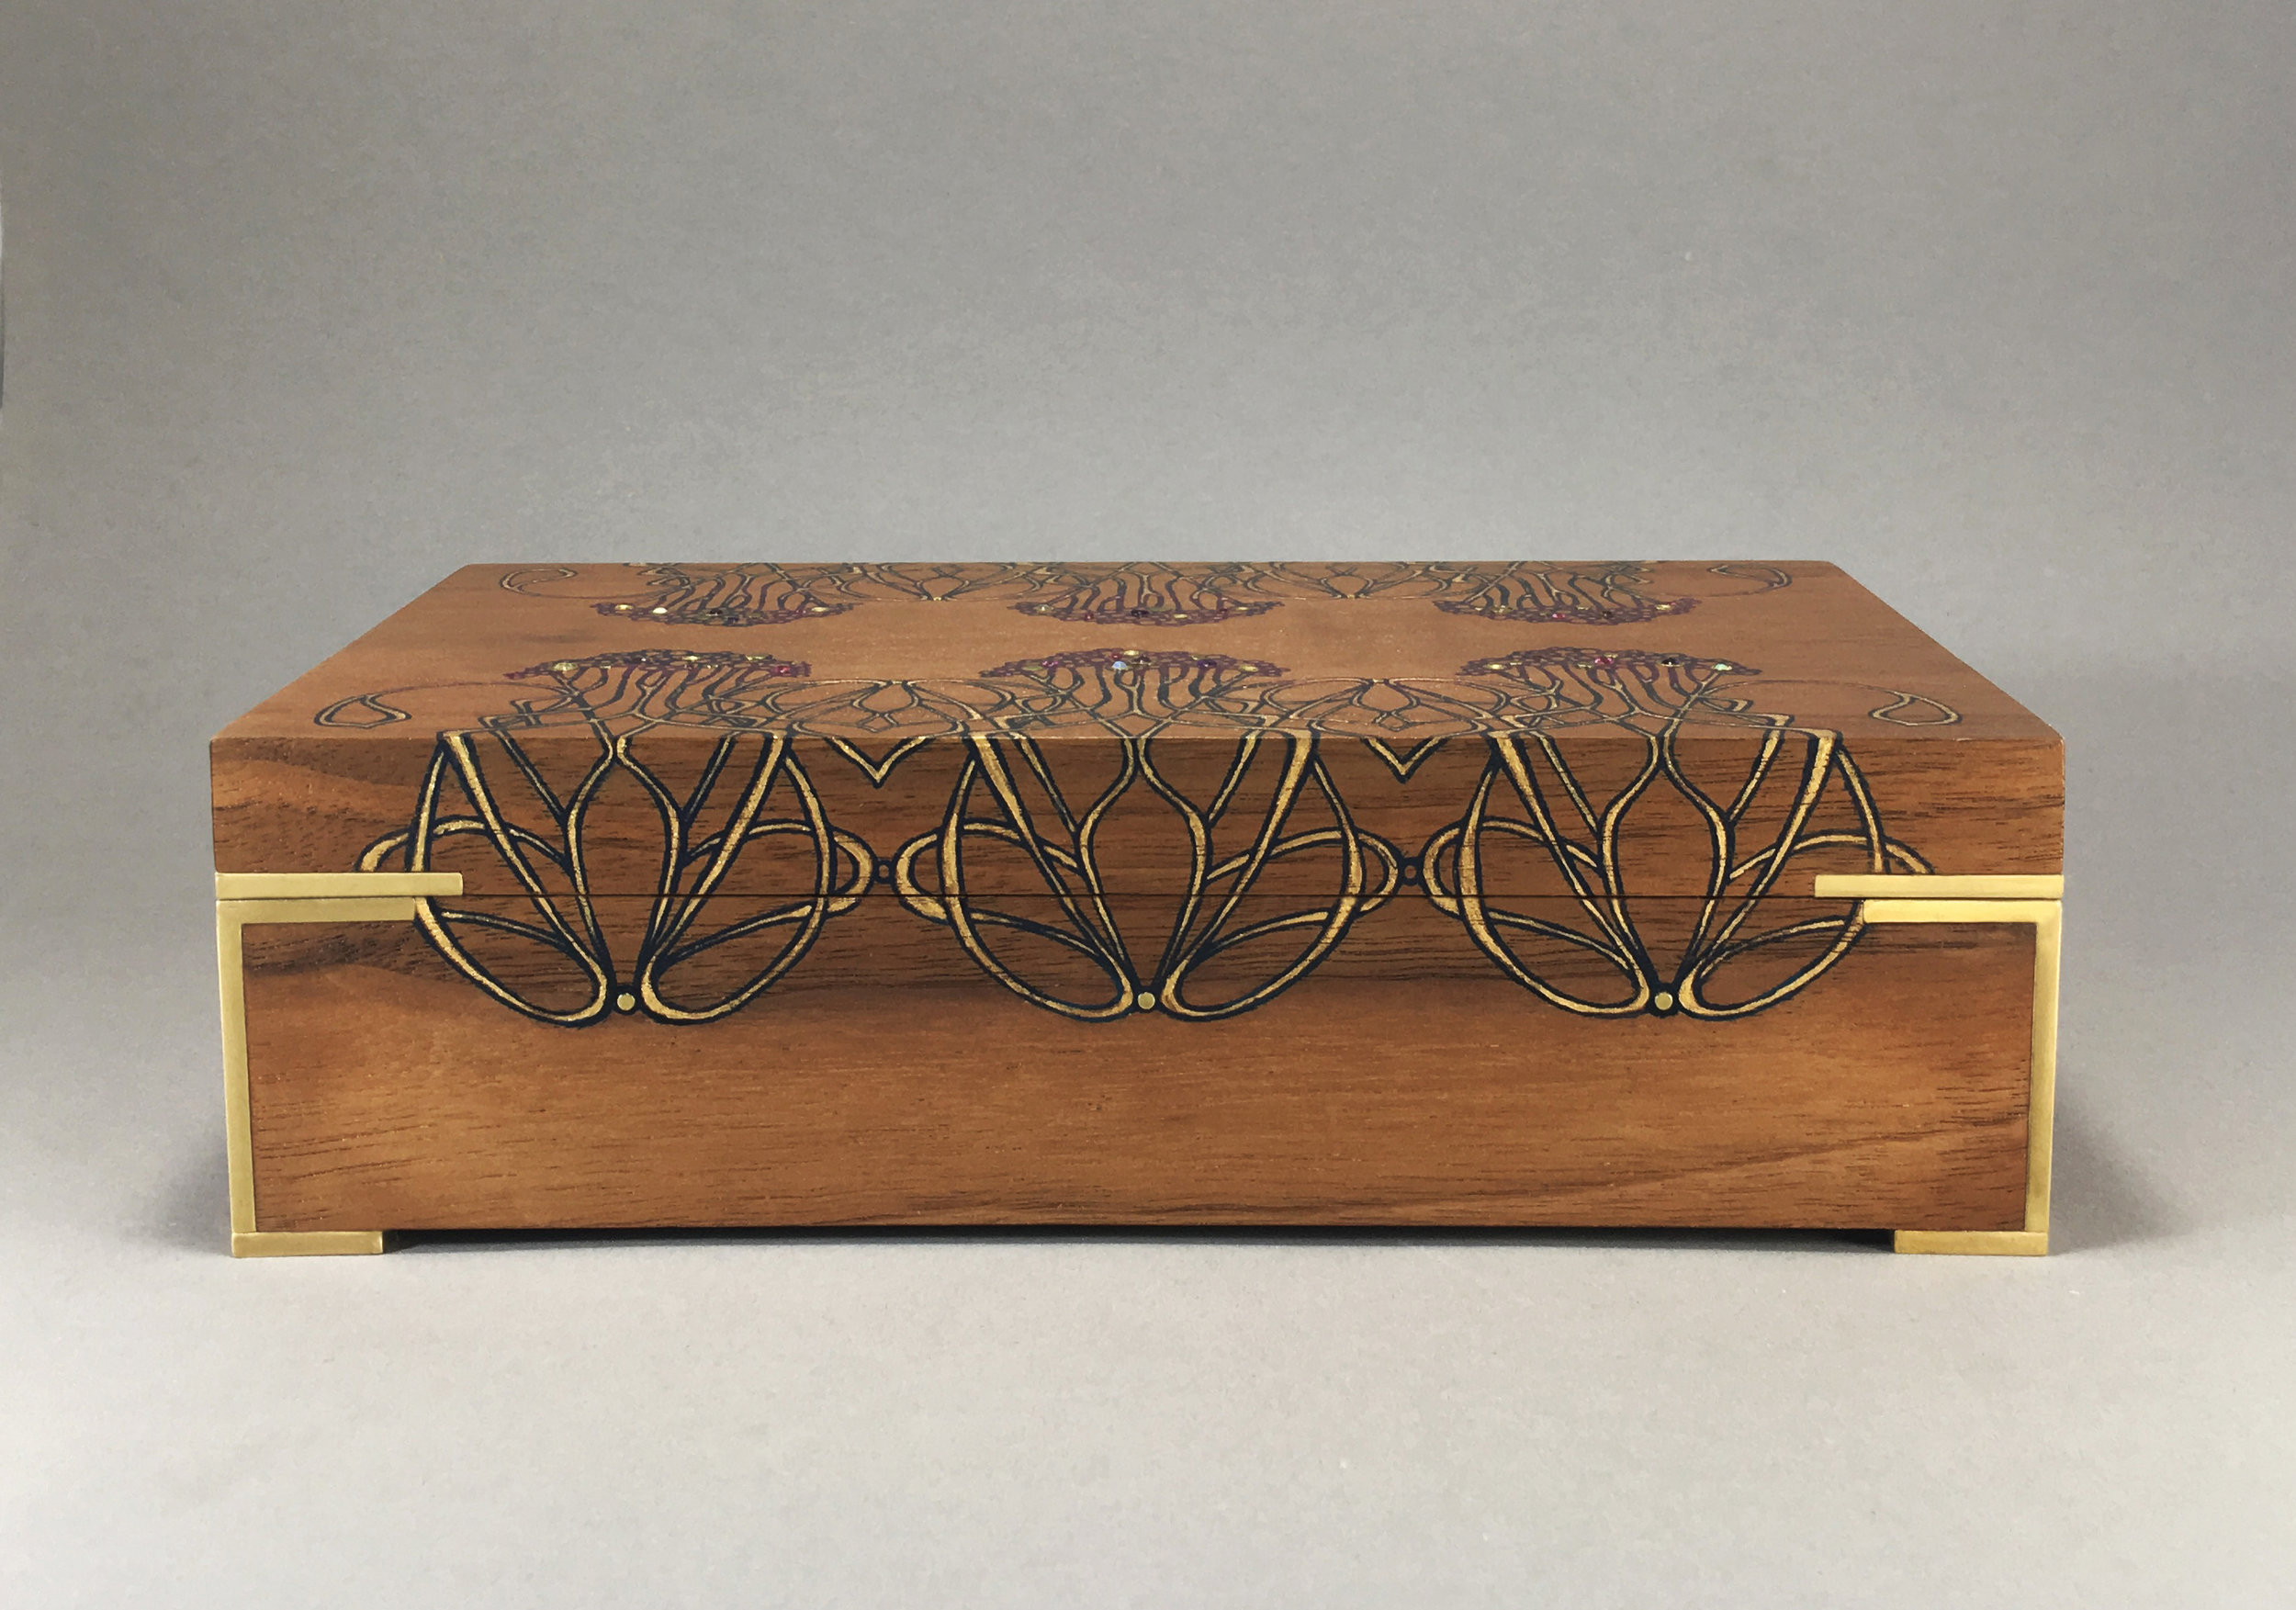 "new nouveau  box, walnut, 9"" x 5"" x 2.75"", brass, amethyst, opals, rhodolite and white topaz gemstones, lined with navy suede, $450"